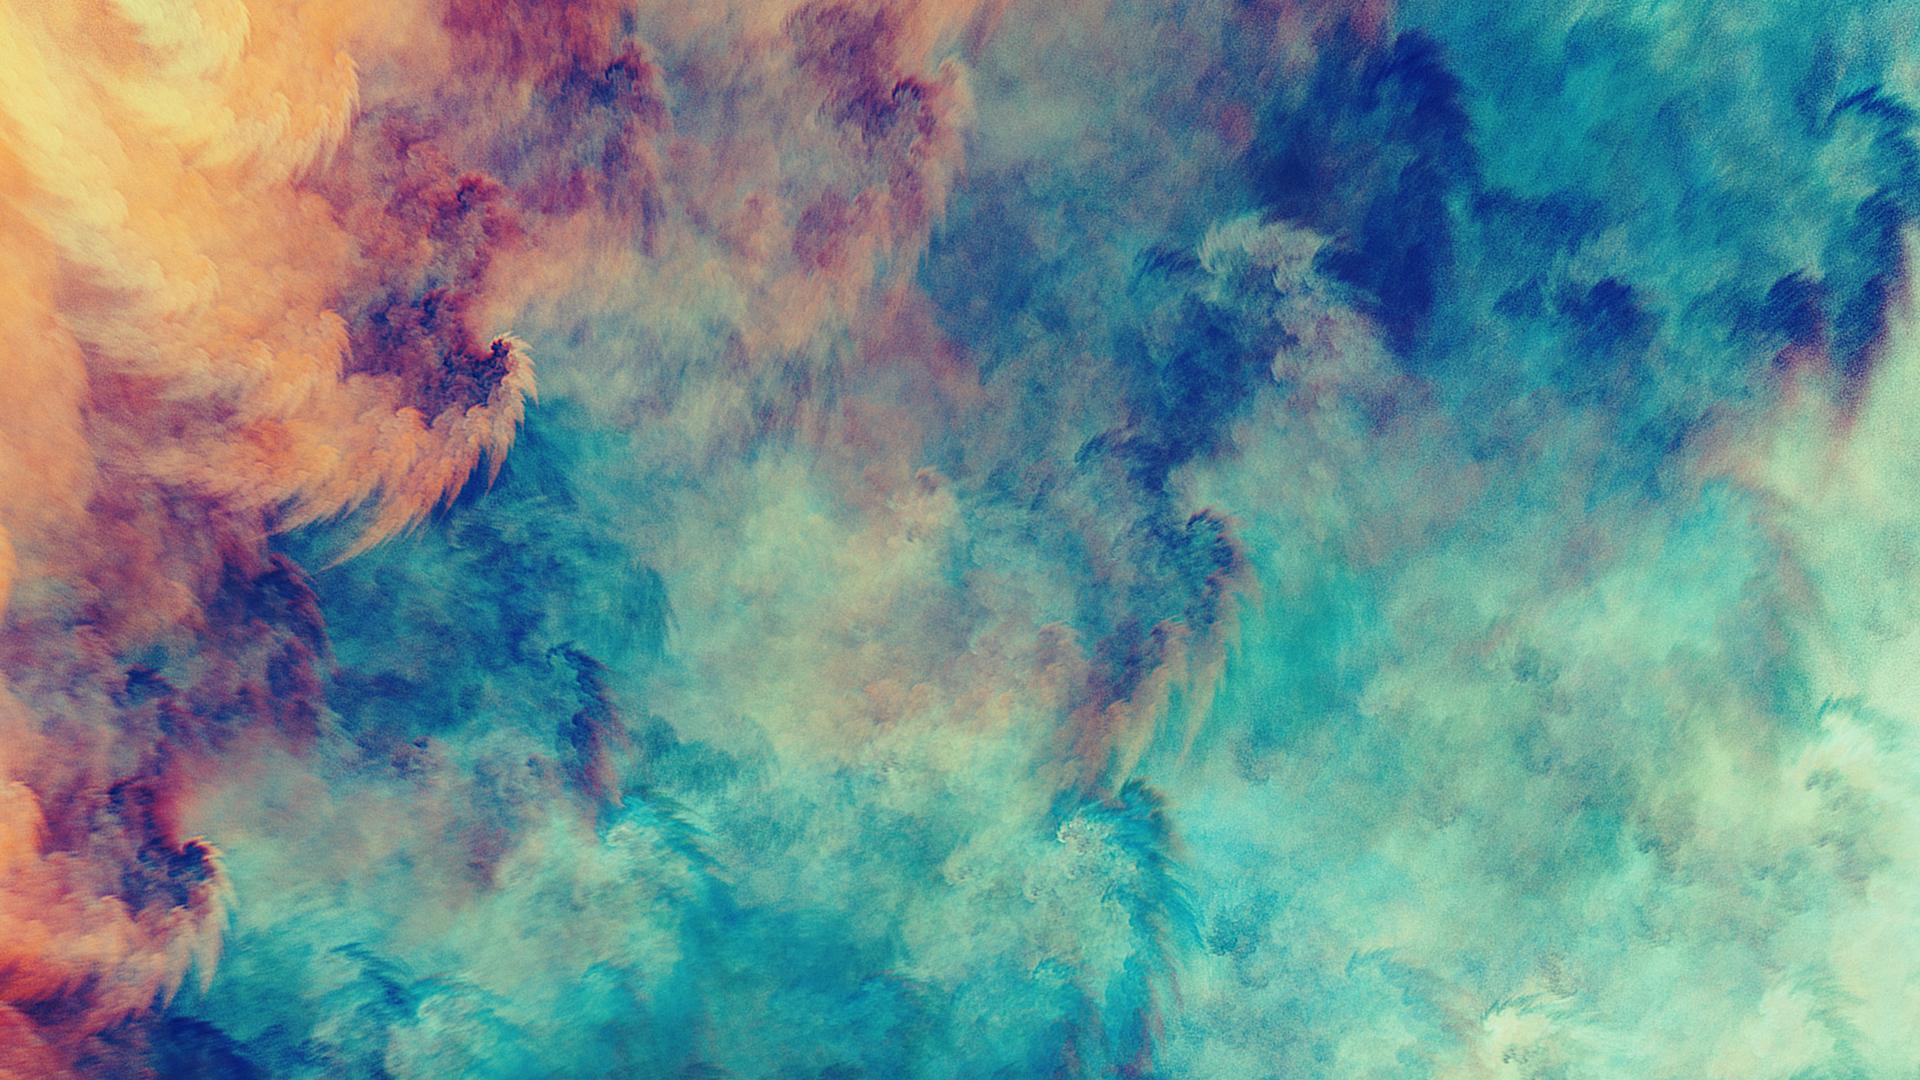 Colour Dream by tatasz on DeviantArt